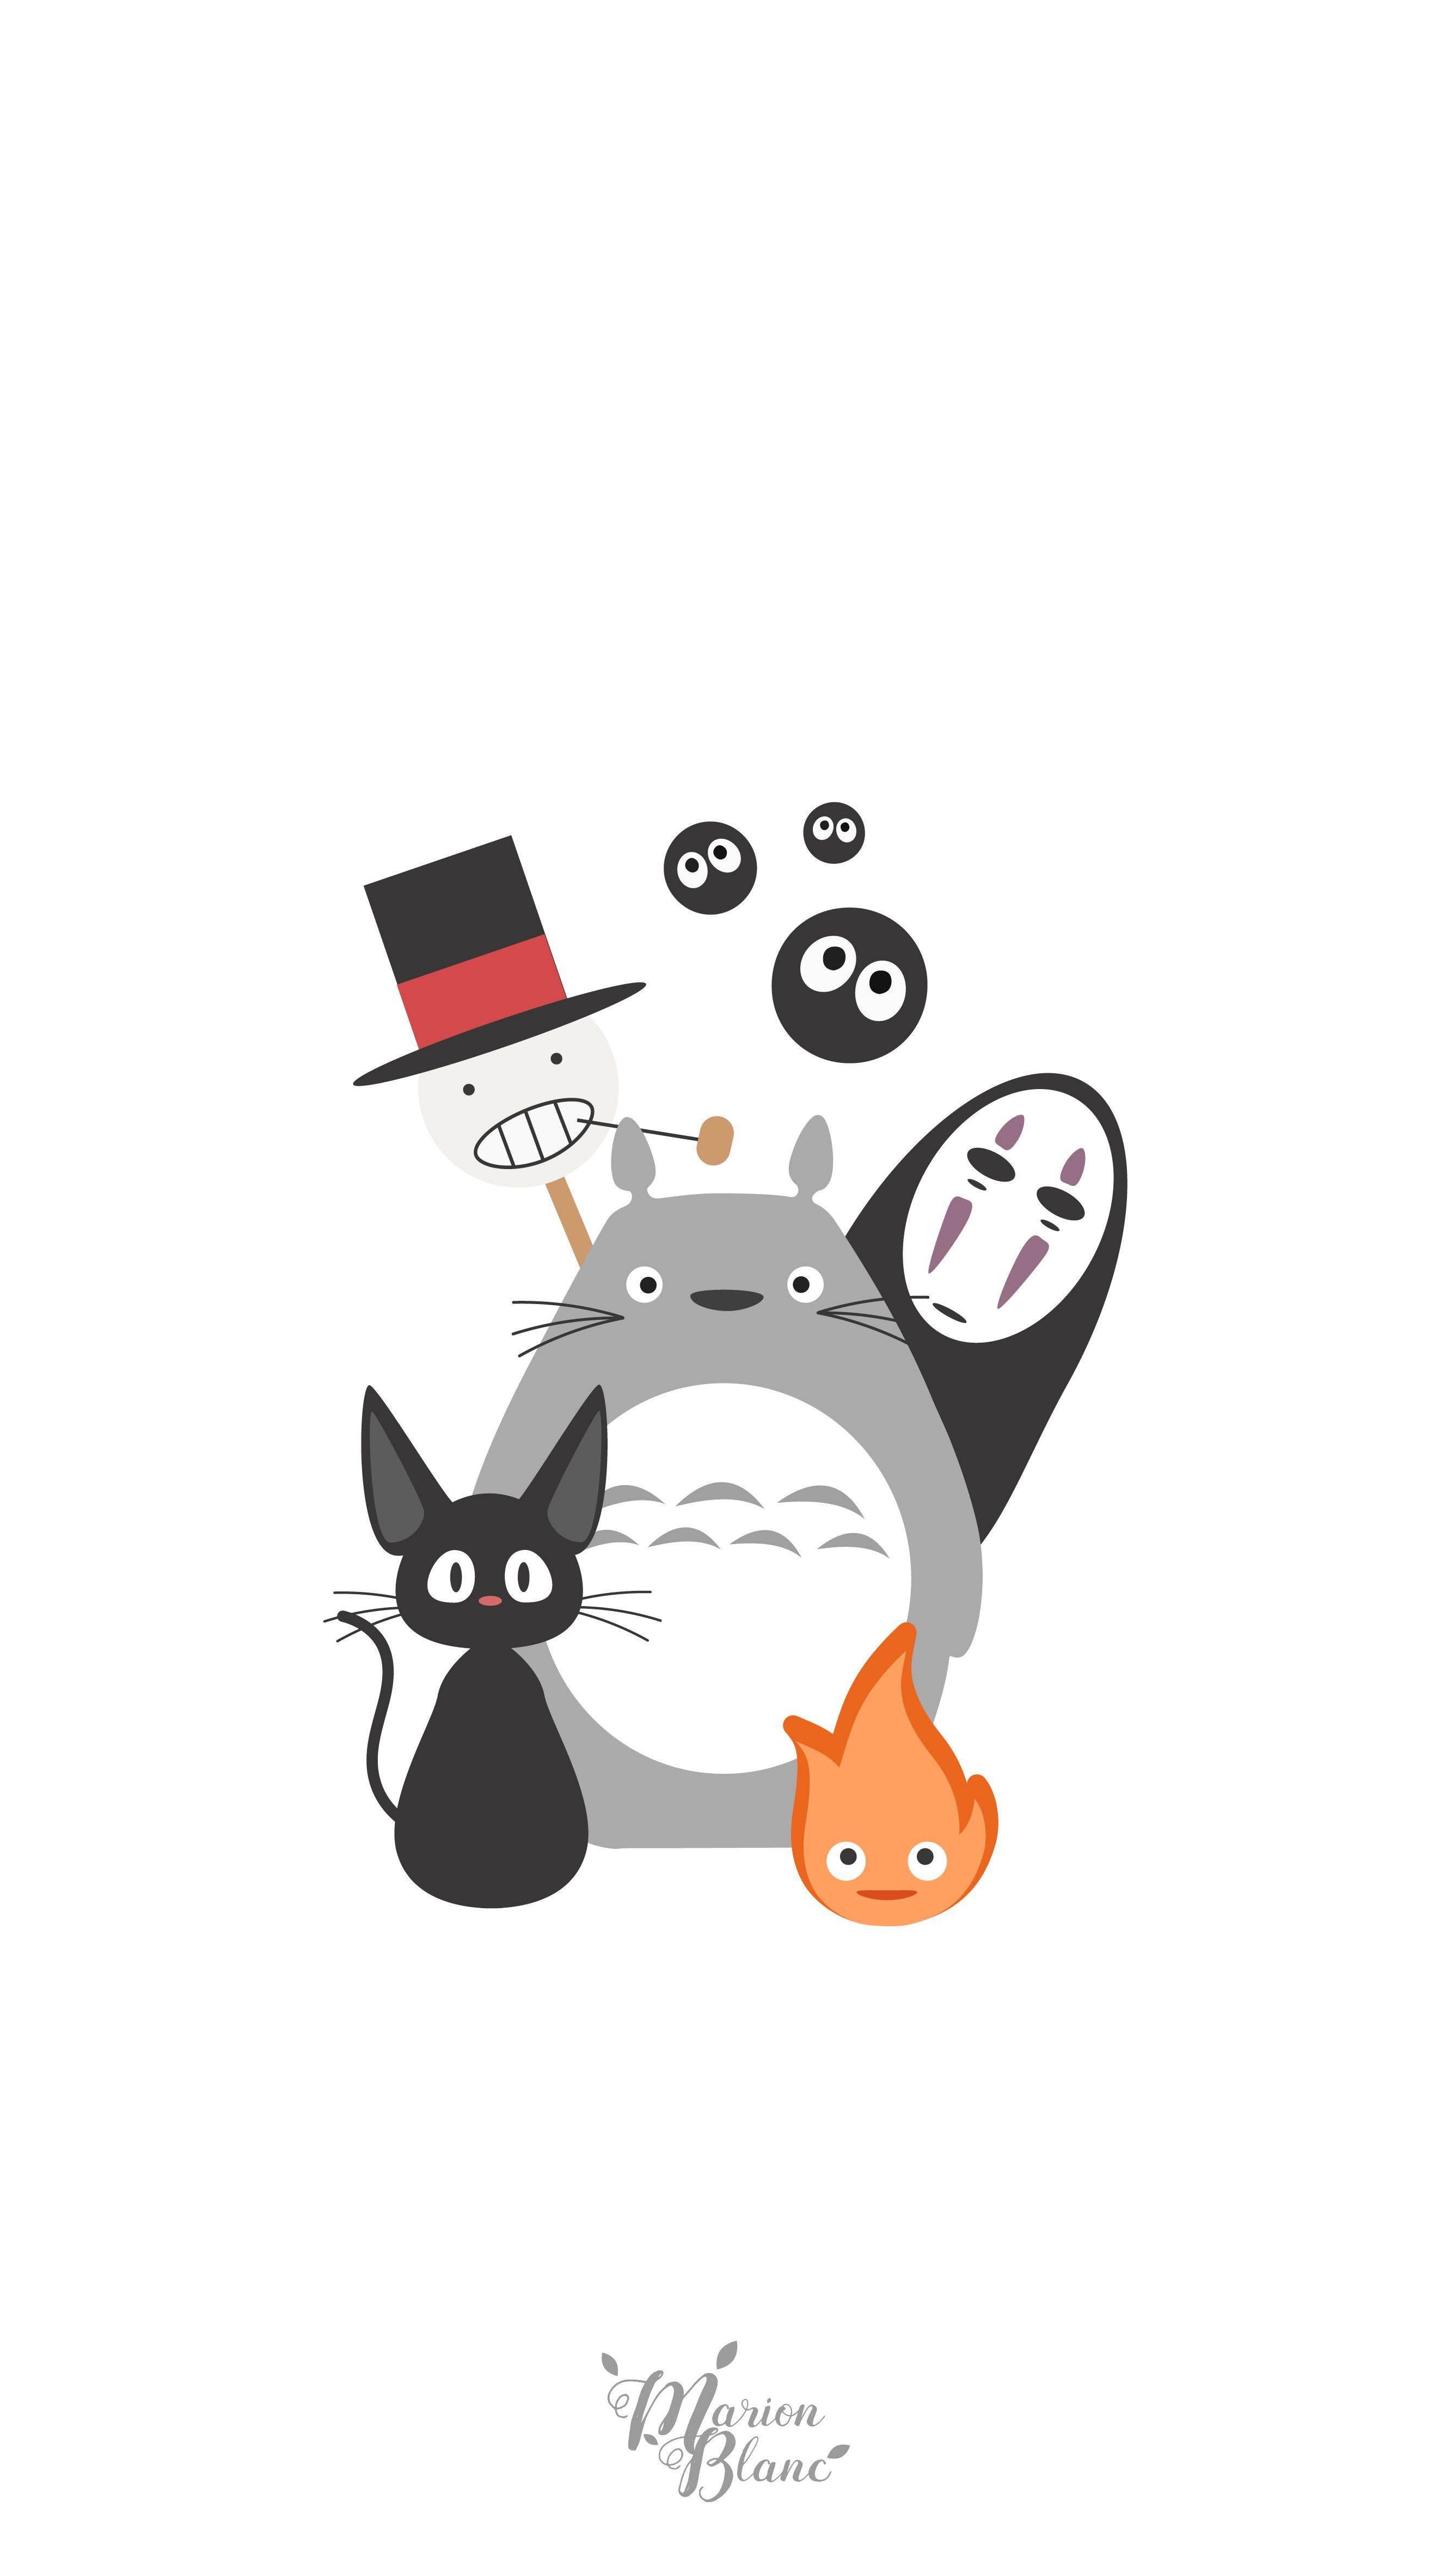 Wallpaper iphone totoro - Ghibli Marion Blanc